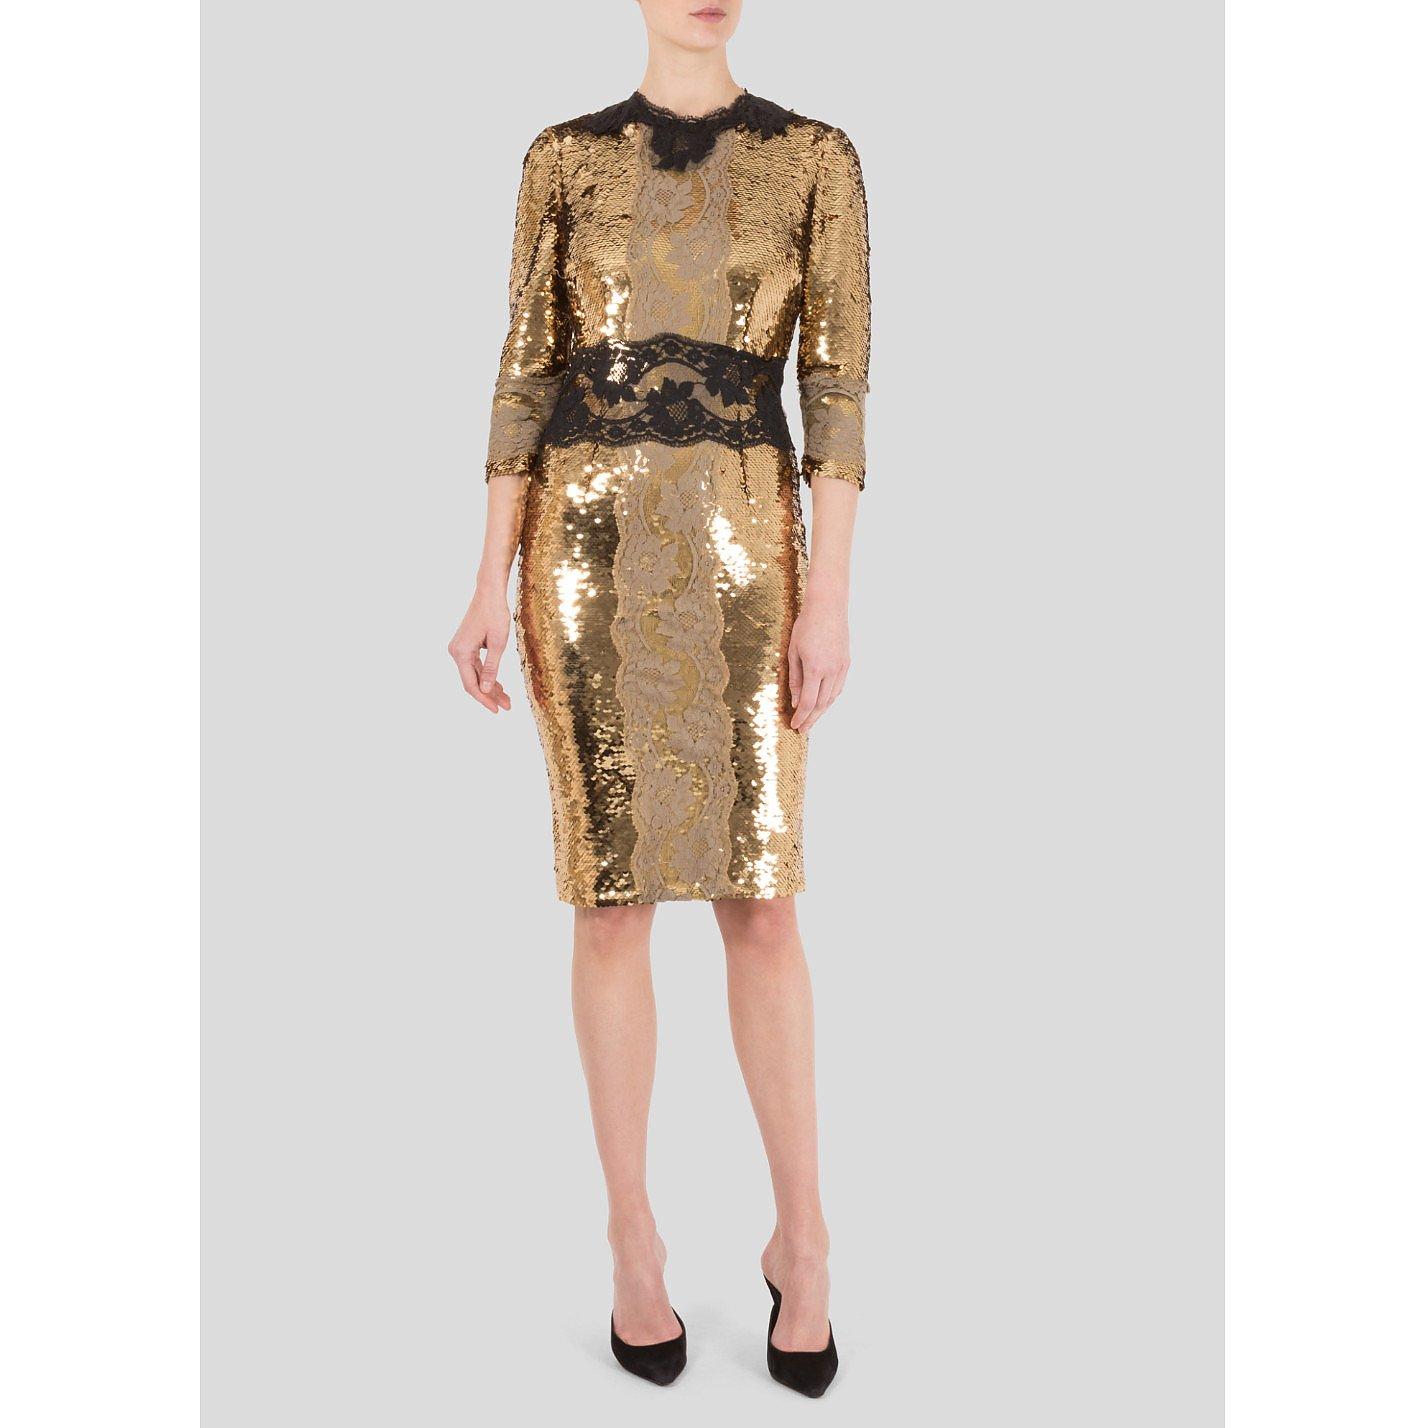 DOLCE & GABBANA Lace Detail Sequin Dress